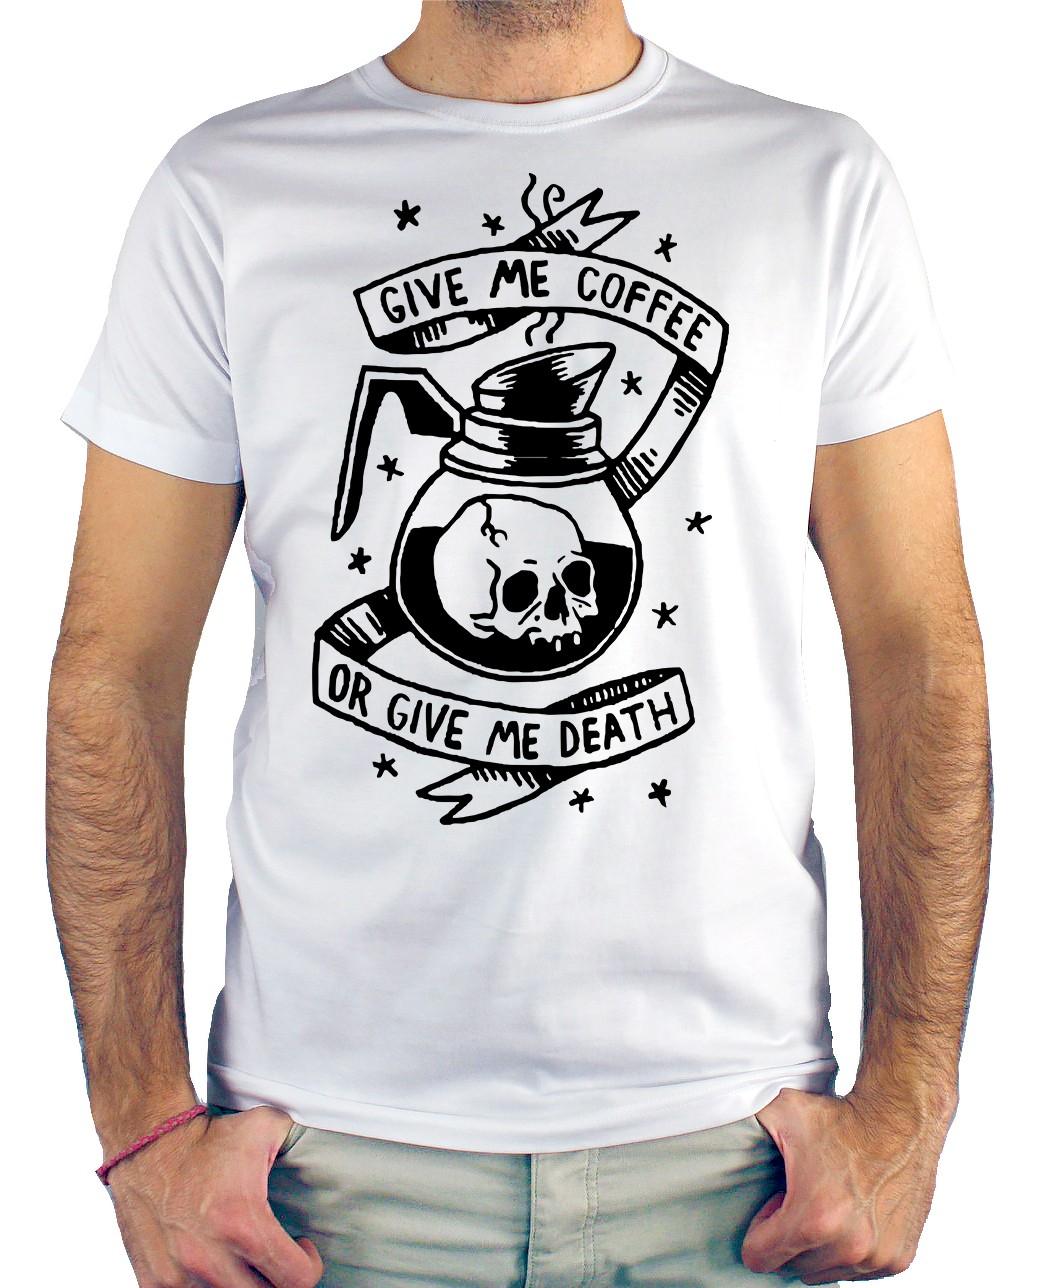 COFFEE OR DEATH